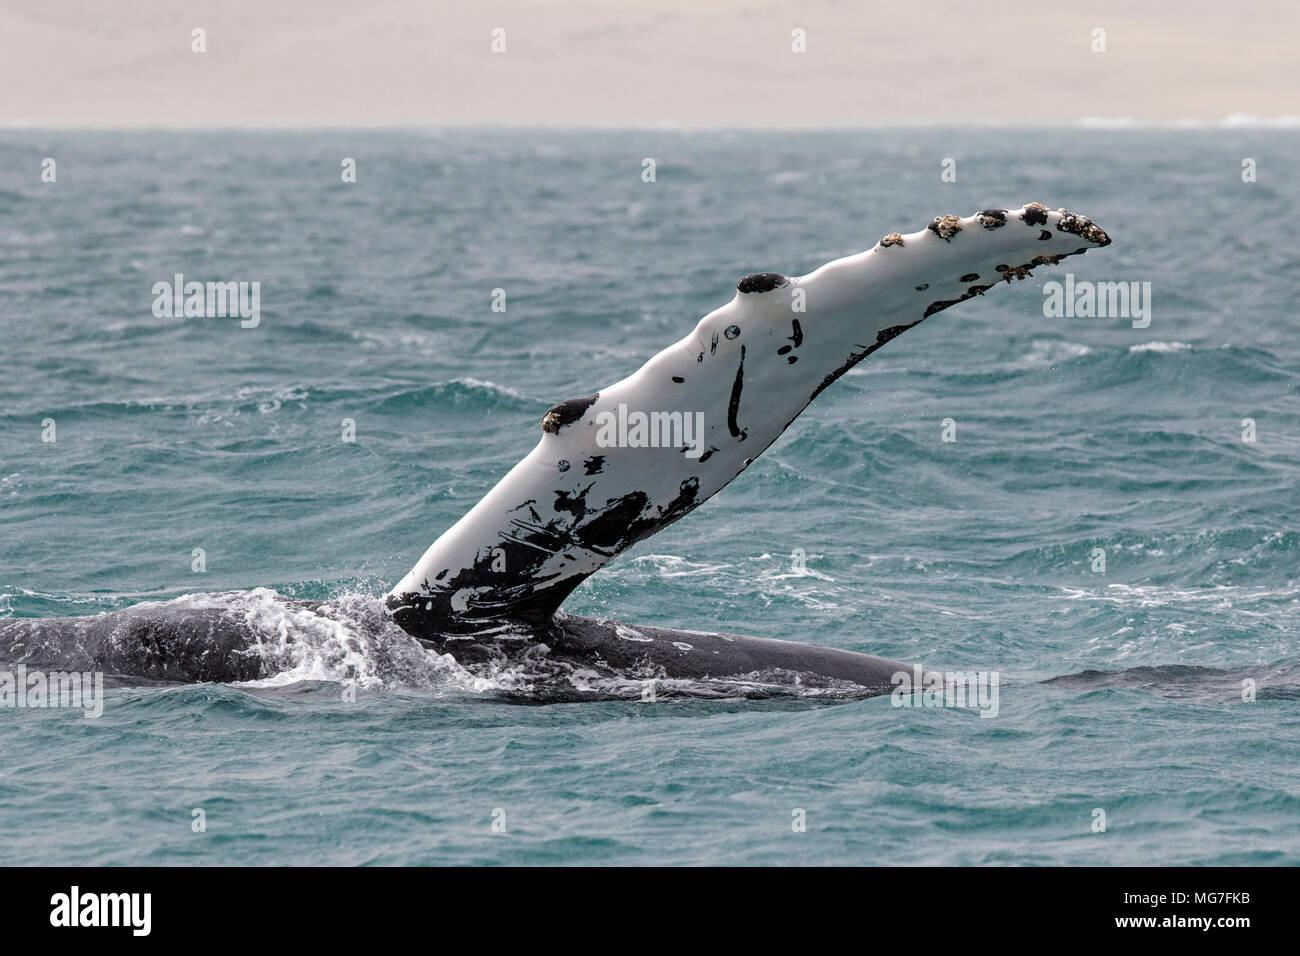 Humpback Whale (Megaptera novaeangliae), Boa Vista, Cape Verde - Stock Image